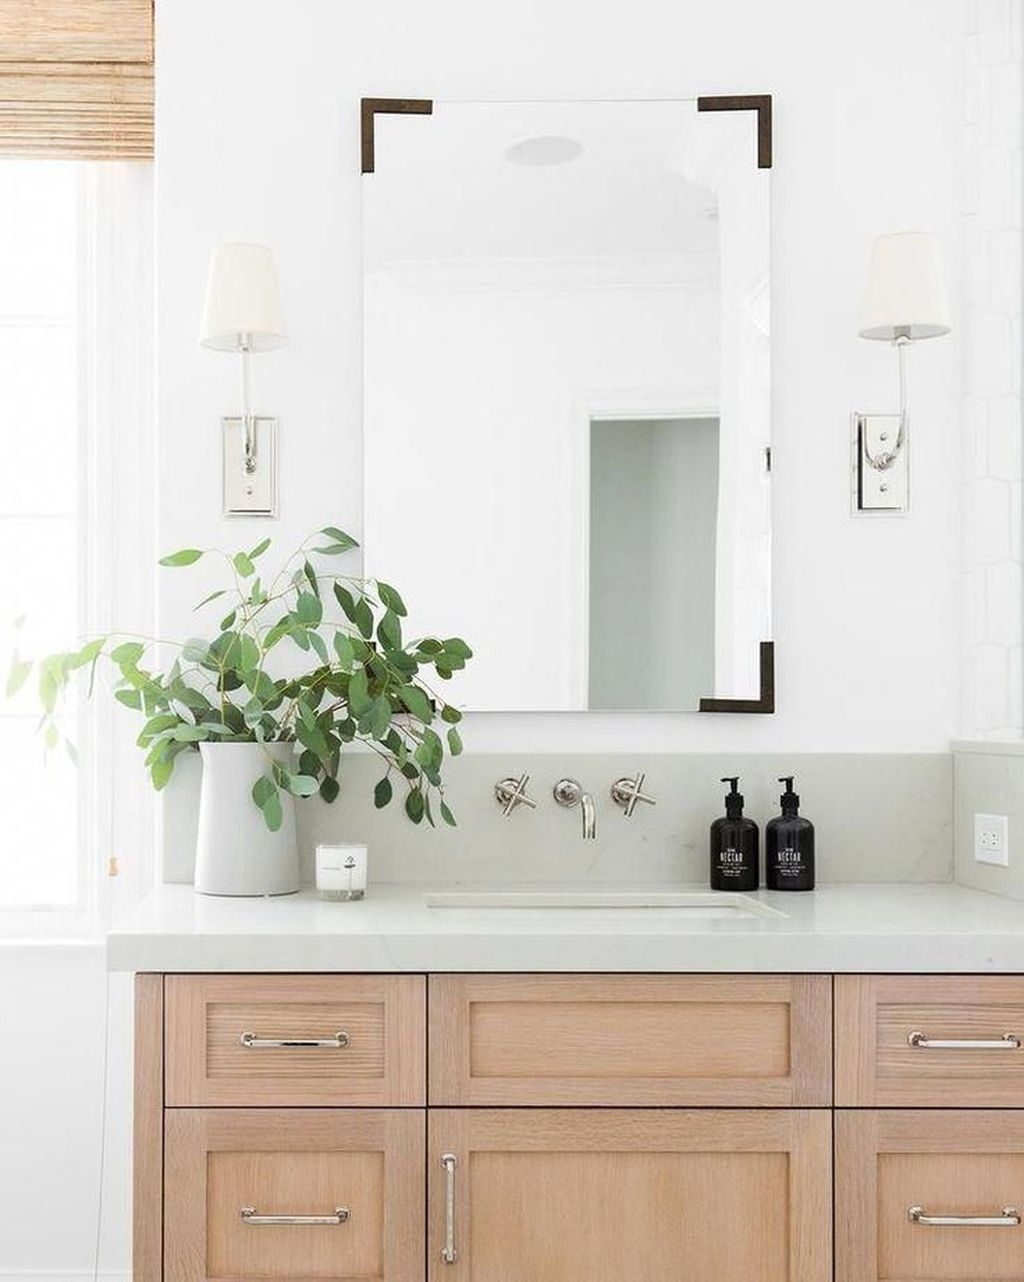 Admirable Rustic Modern Bathroom Design And Decor Ideas 03